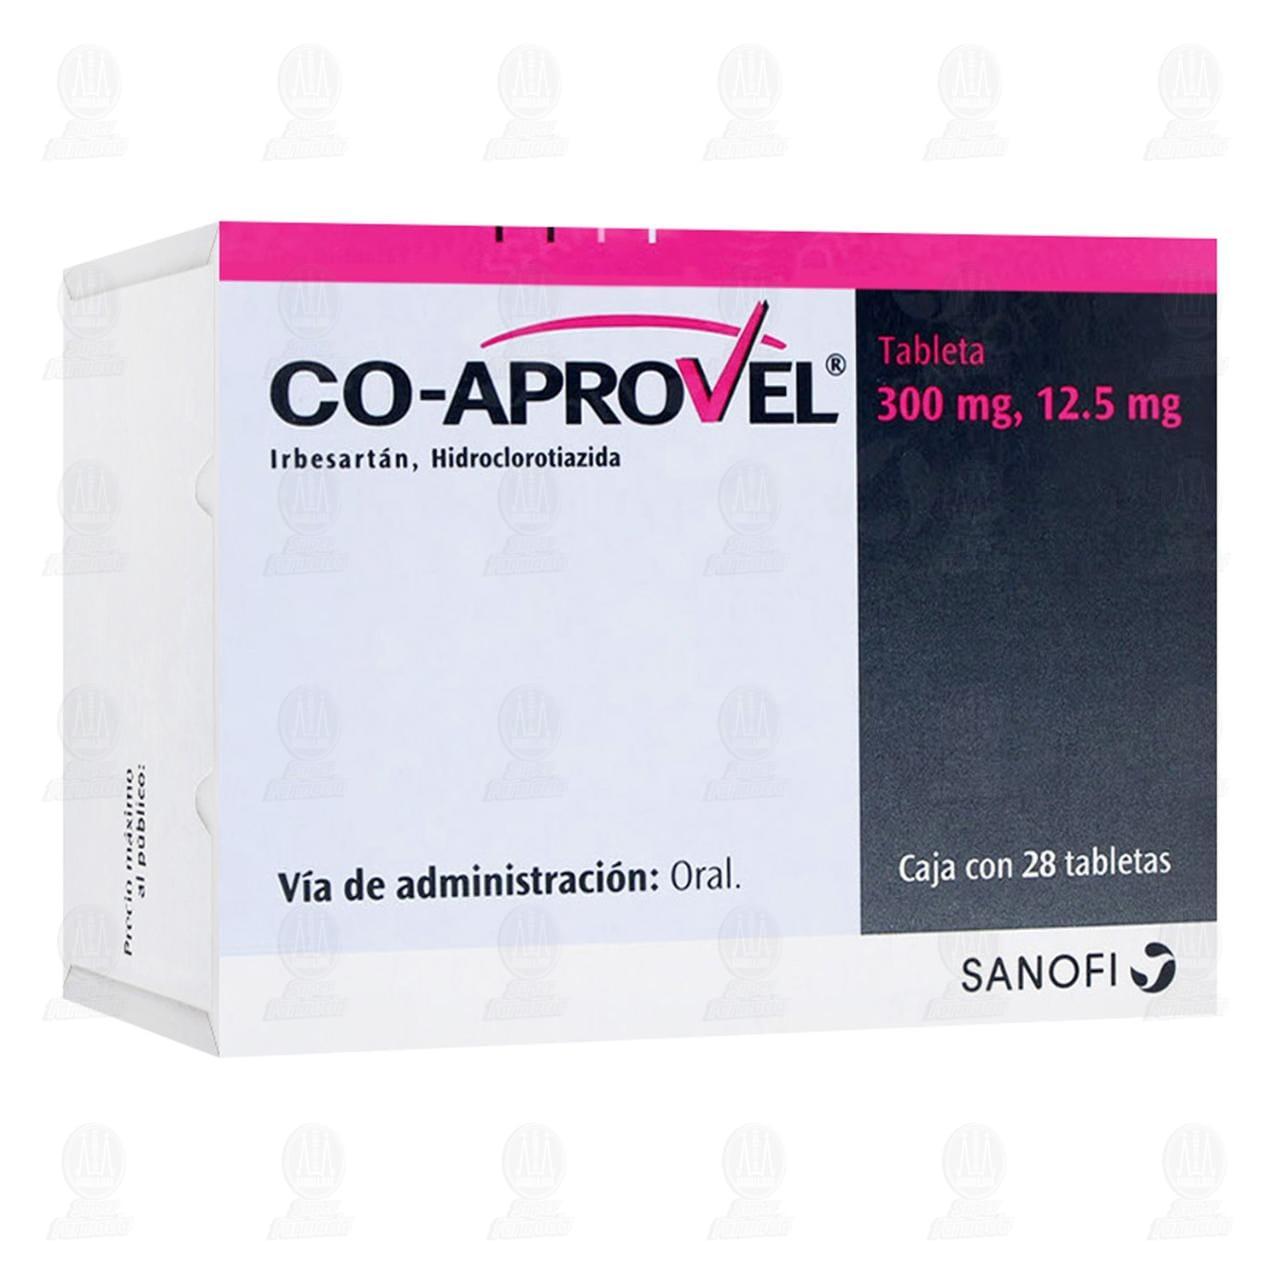 Comprar Coaprovel 300mg/12.5mg 28 Tabletas en Farmacias Guadalajara